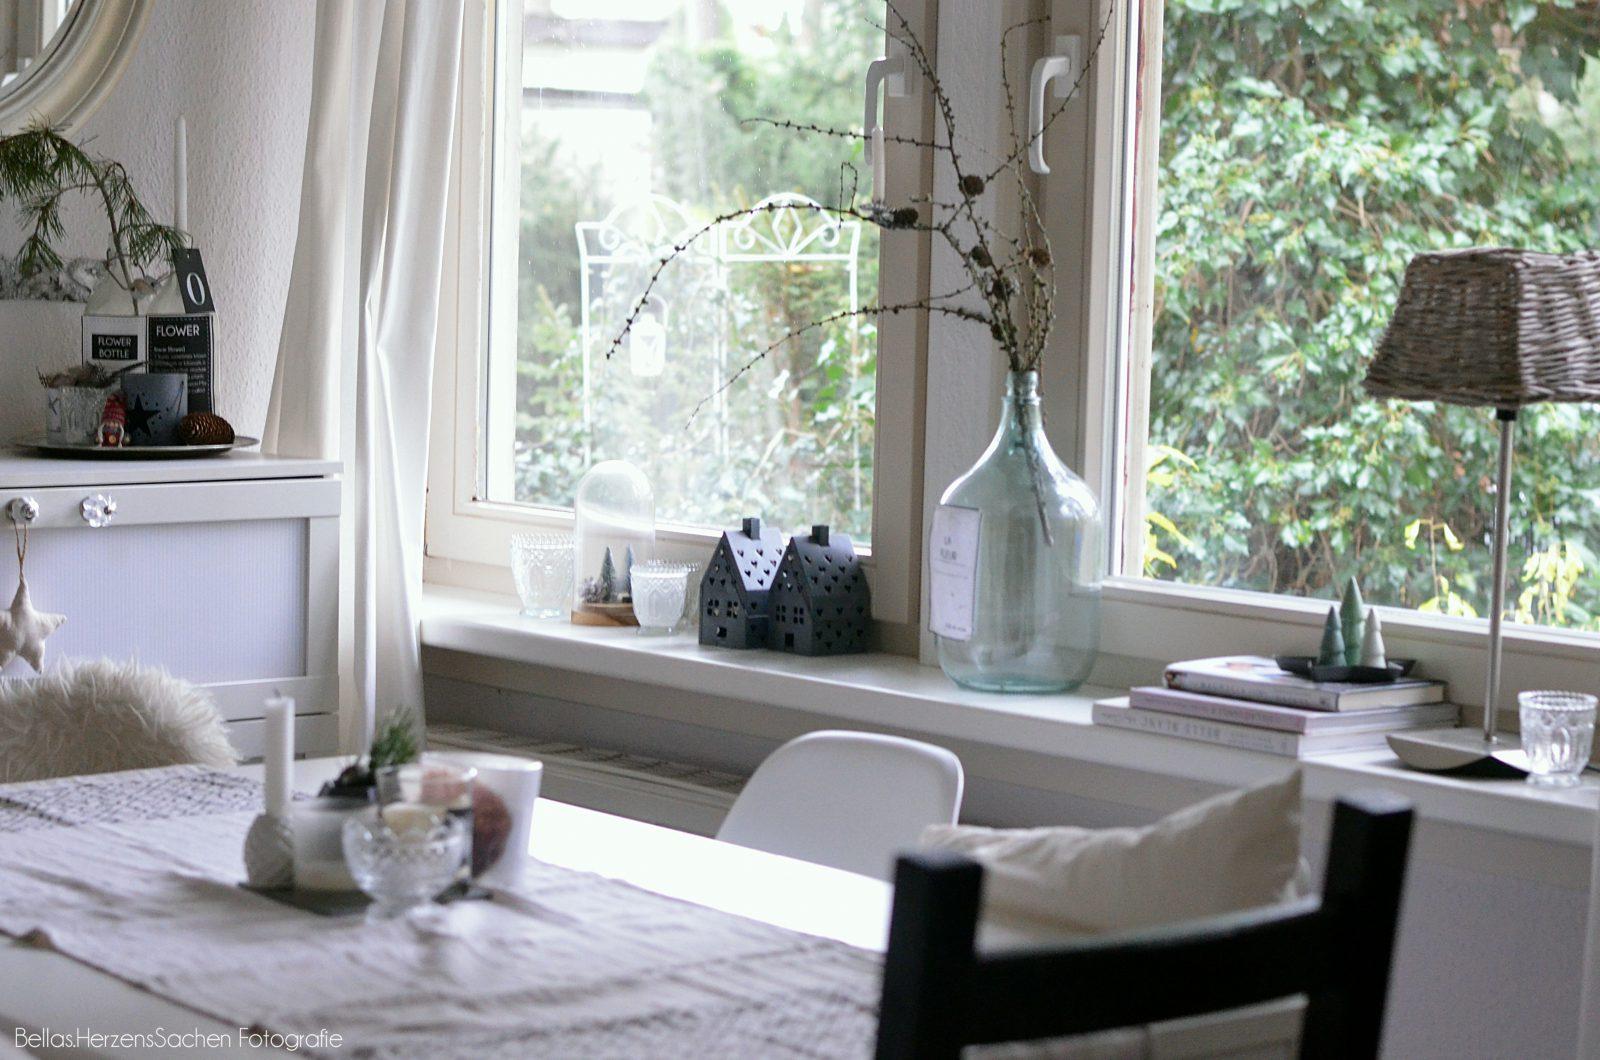 Fensterbrettdeko step-by-step Anleitung